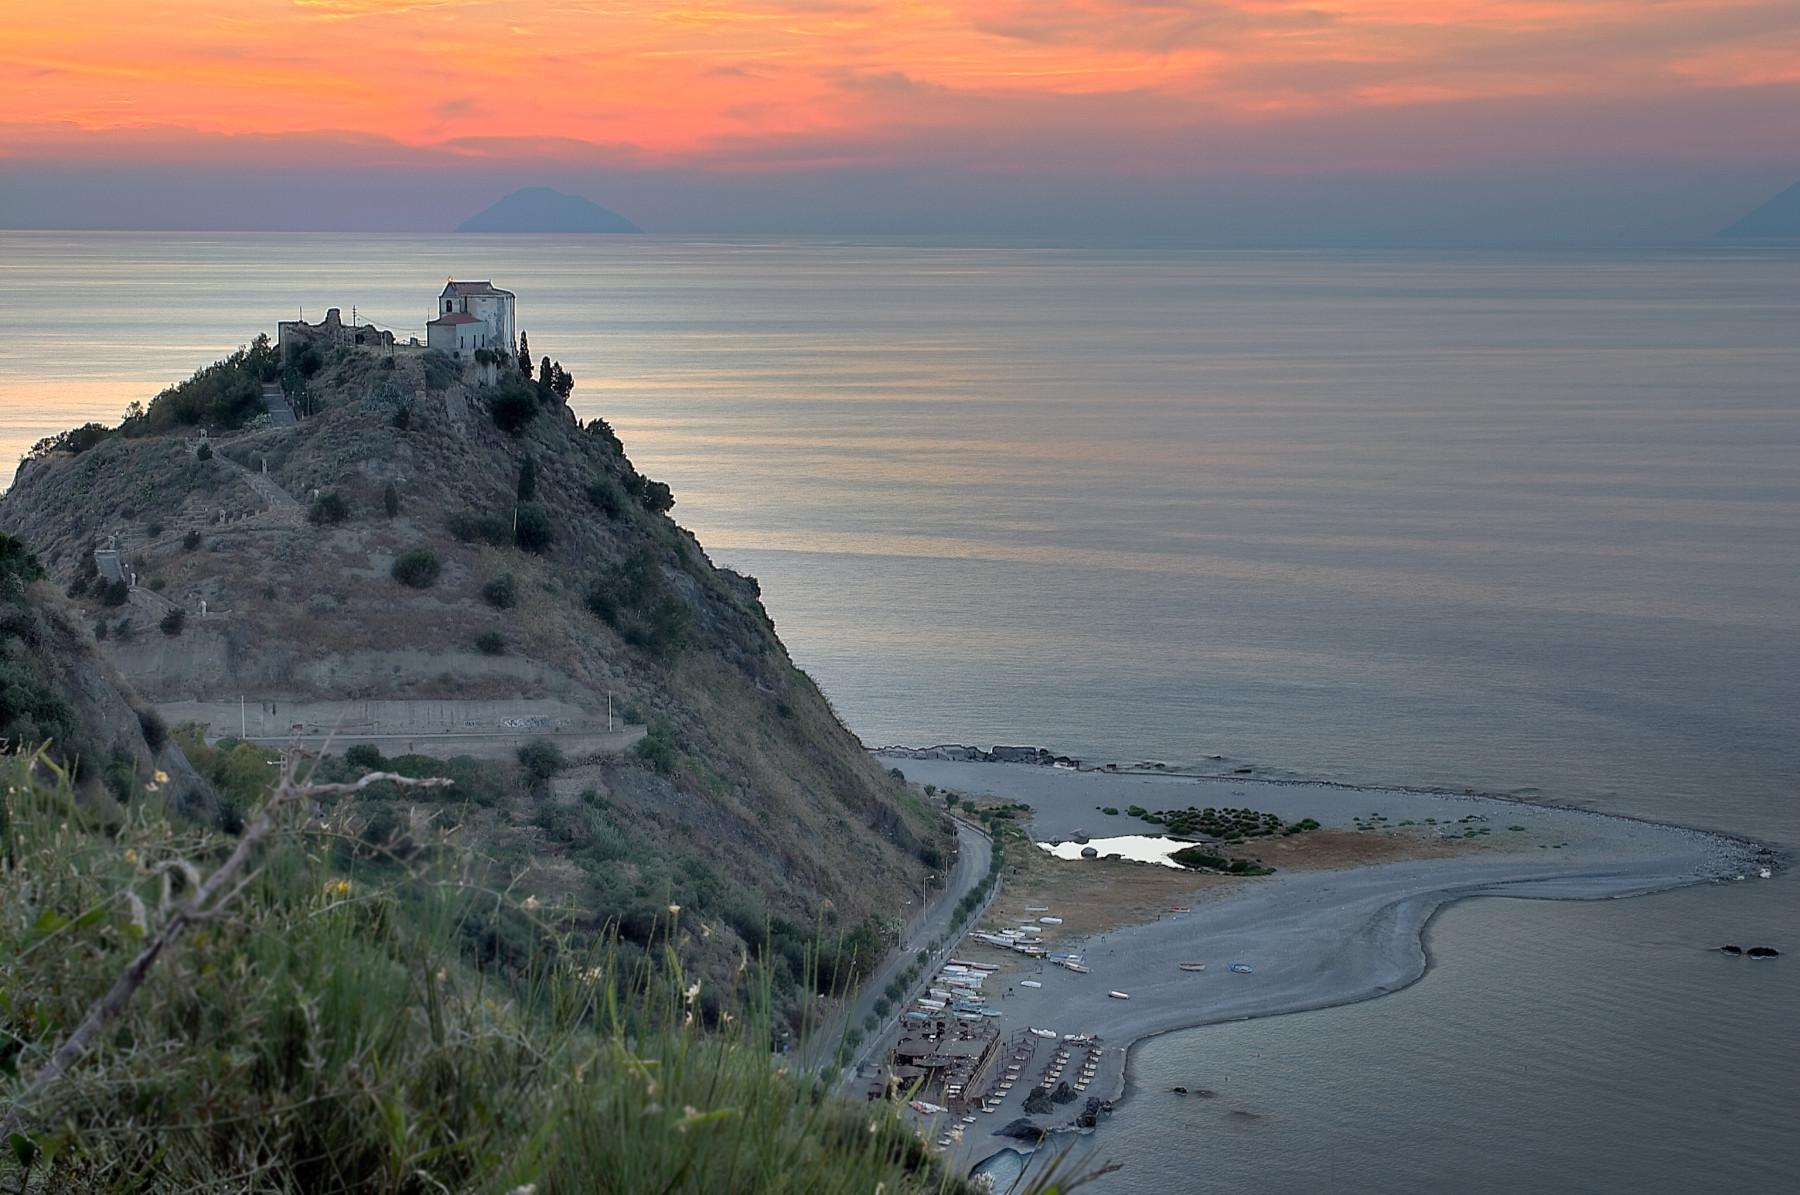 Monte della Madonna. Вид на острова Аликуди и Филикуди.